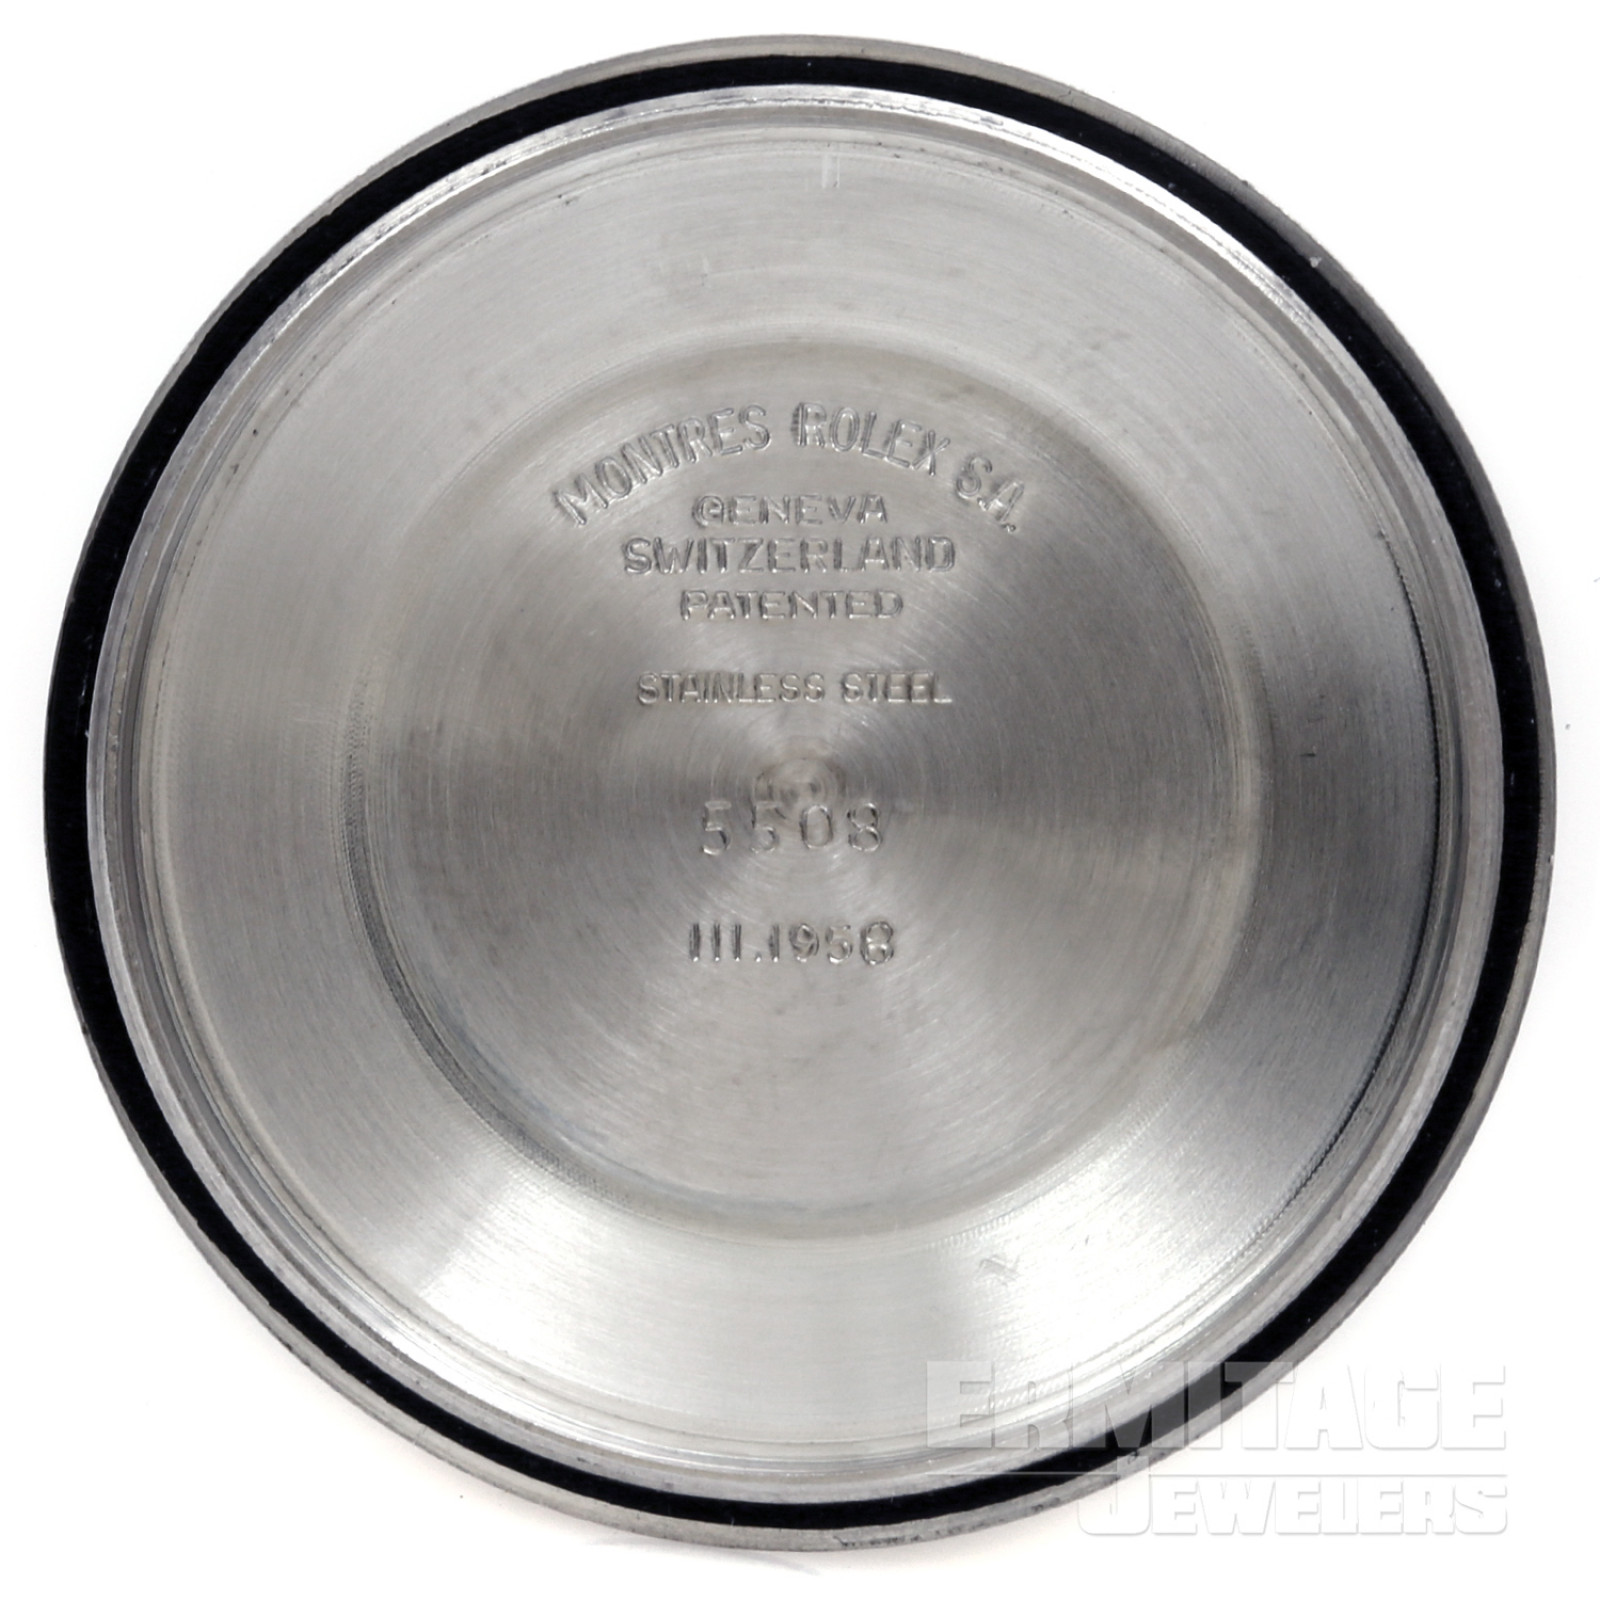 Steel on Oyster Stretch Rolex Submariner 5508 38 mm